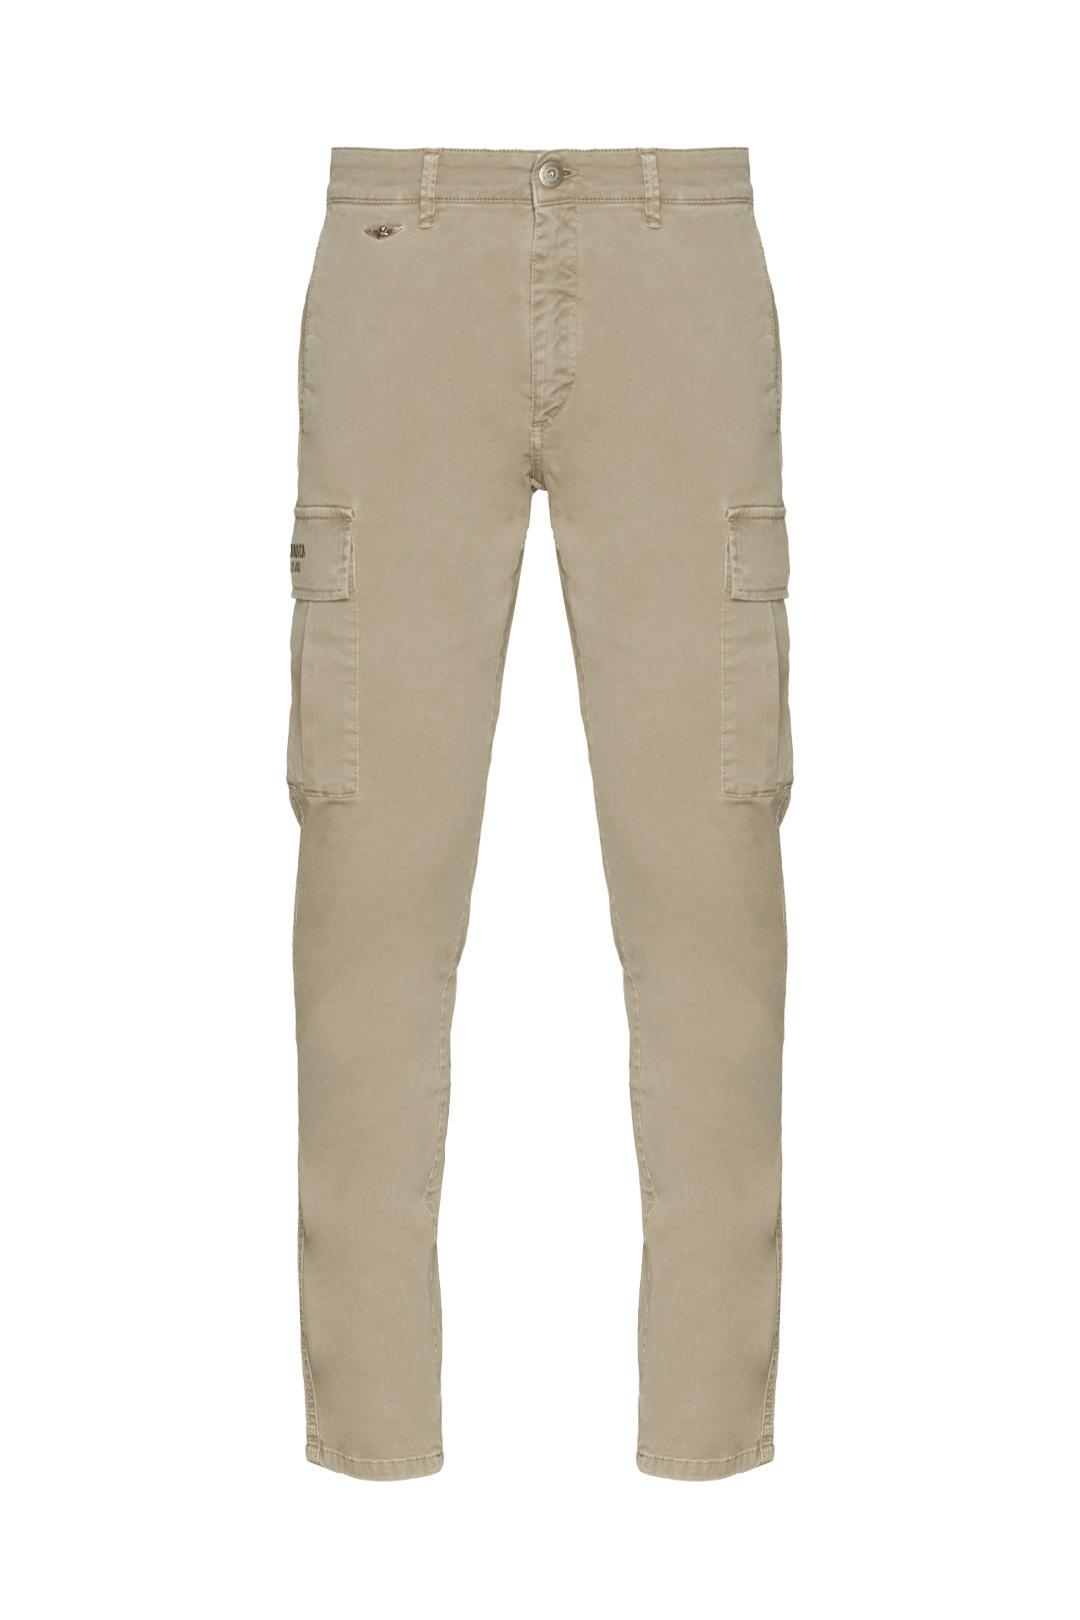 Pantalon multipoches en gabardine